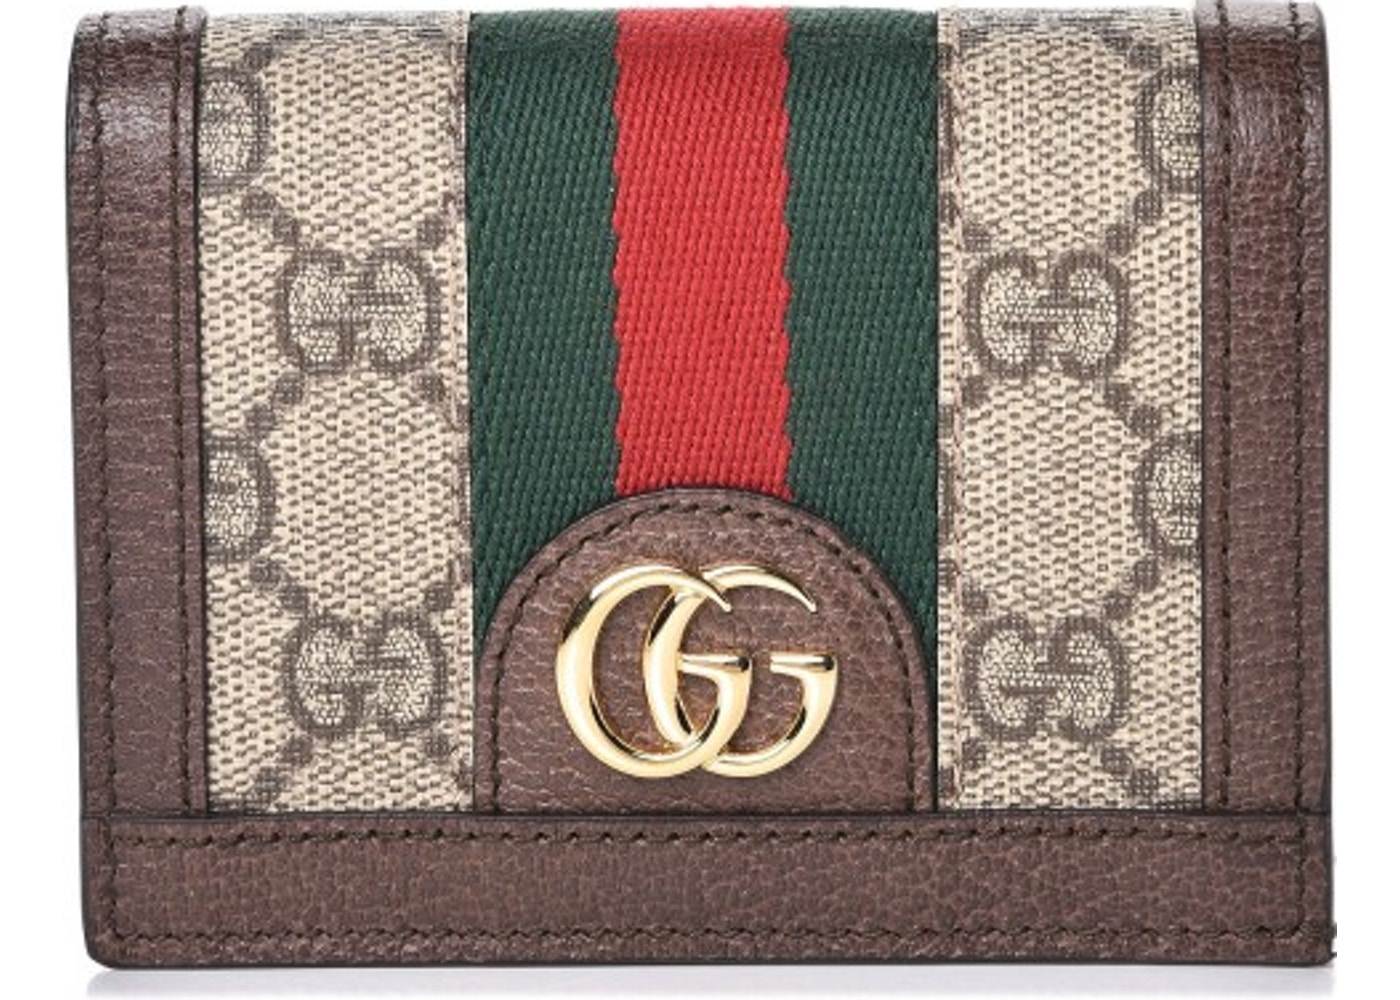 hot sale online a228c bae35 Gucci Ophidia Card Case Monogram GG Supreme Web Brown